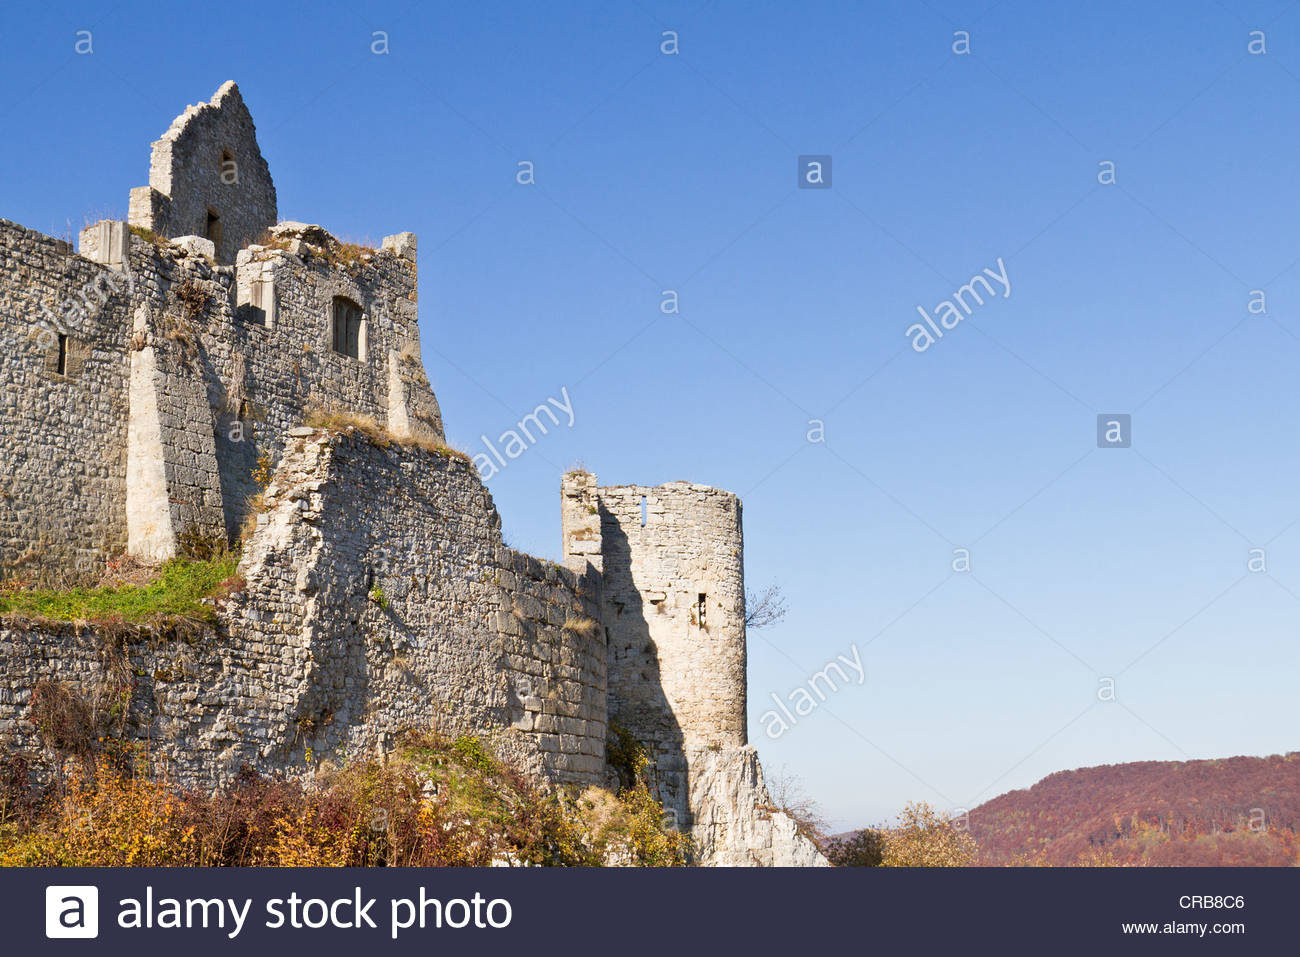 Burg Hohenurach Castle Ruins, Bad Urach, Swabian Alb, Reutlingen.